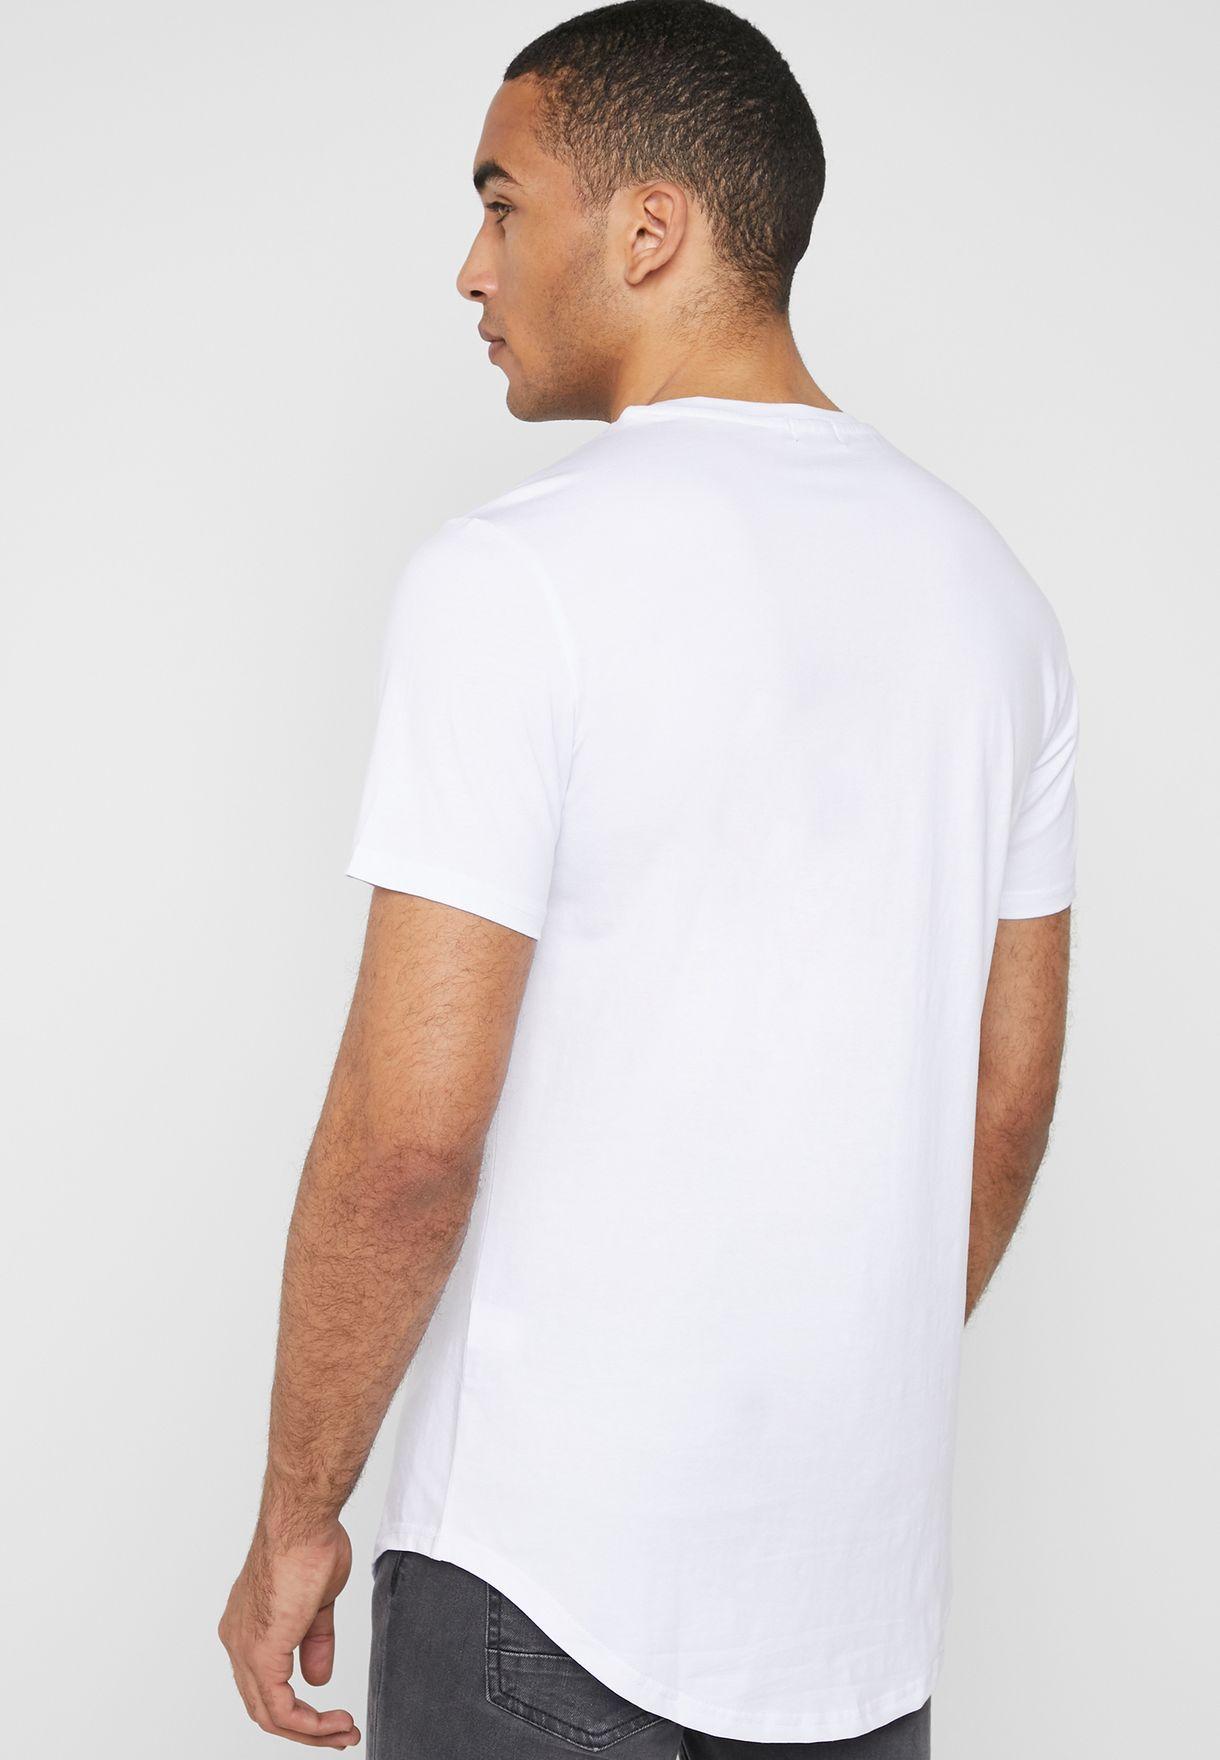 Rock Print Crew Neck T-Shirt